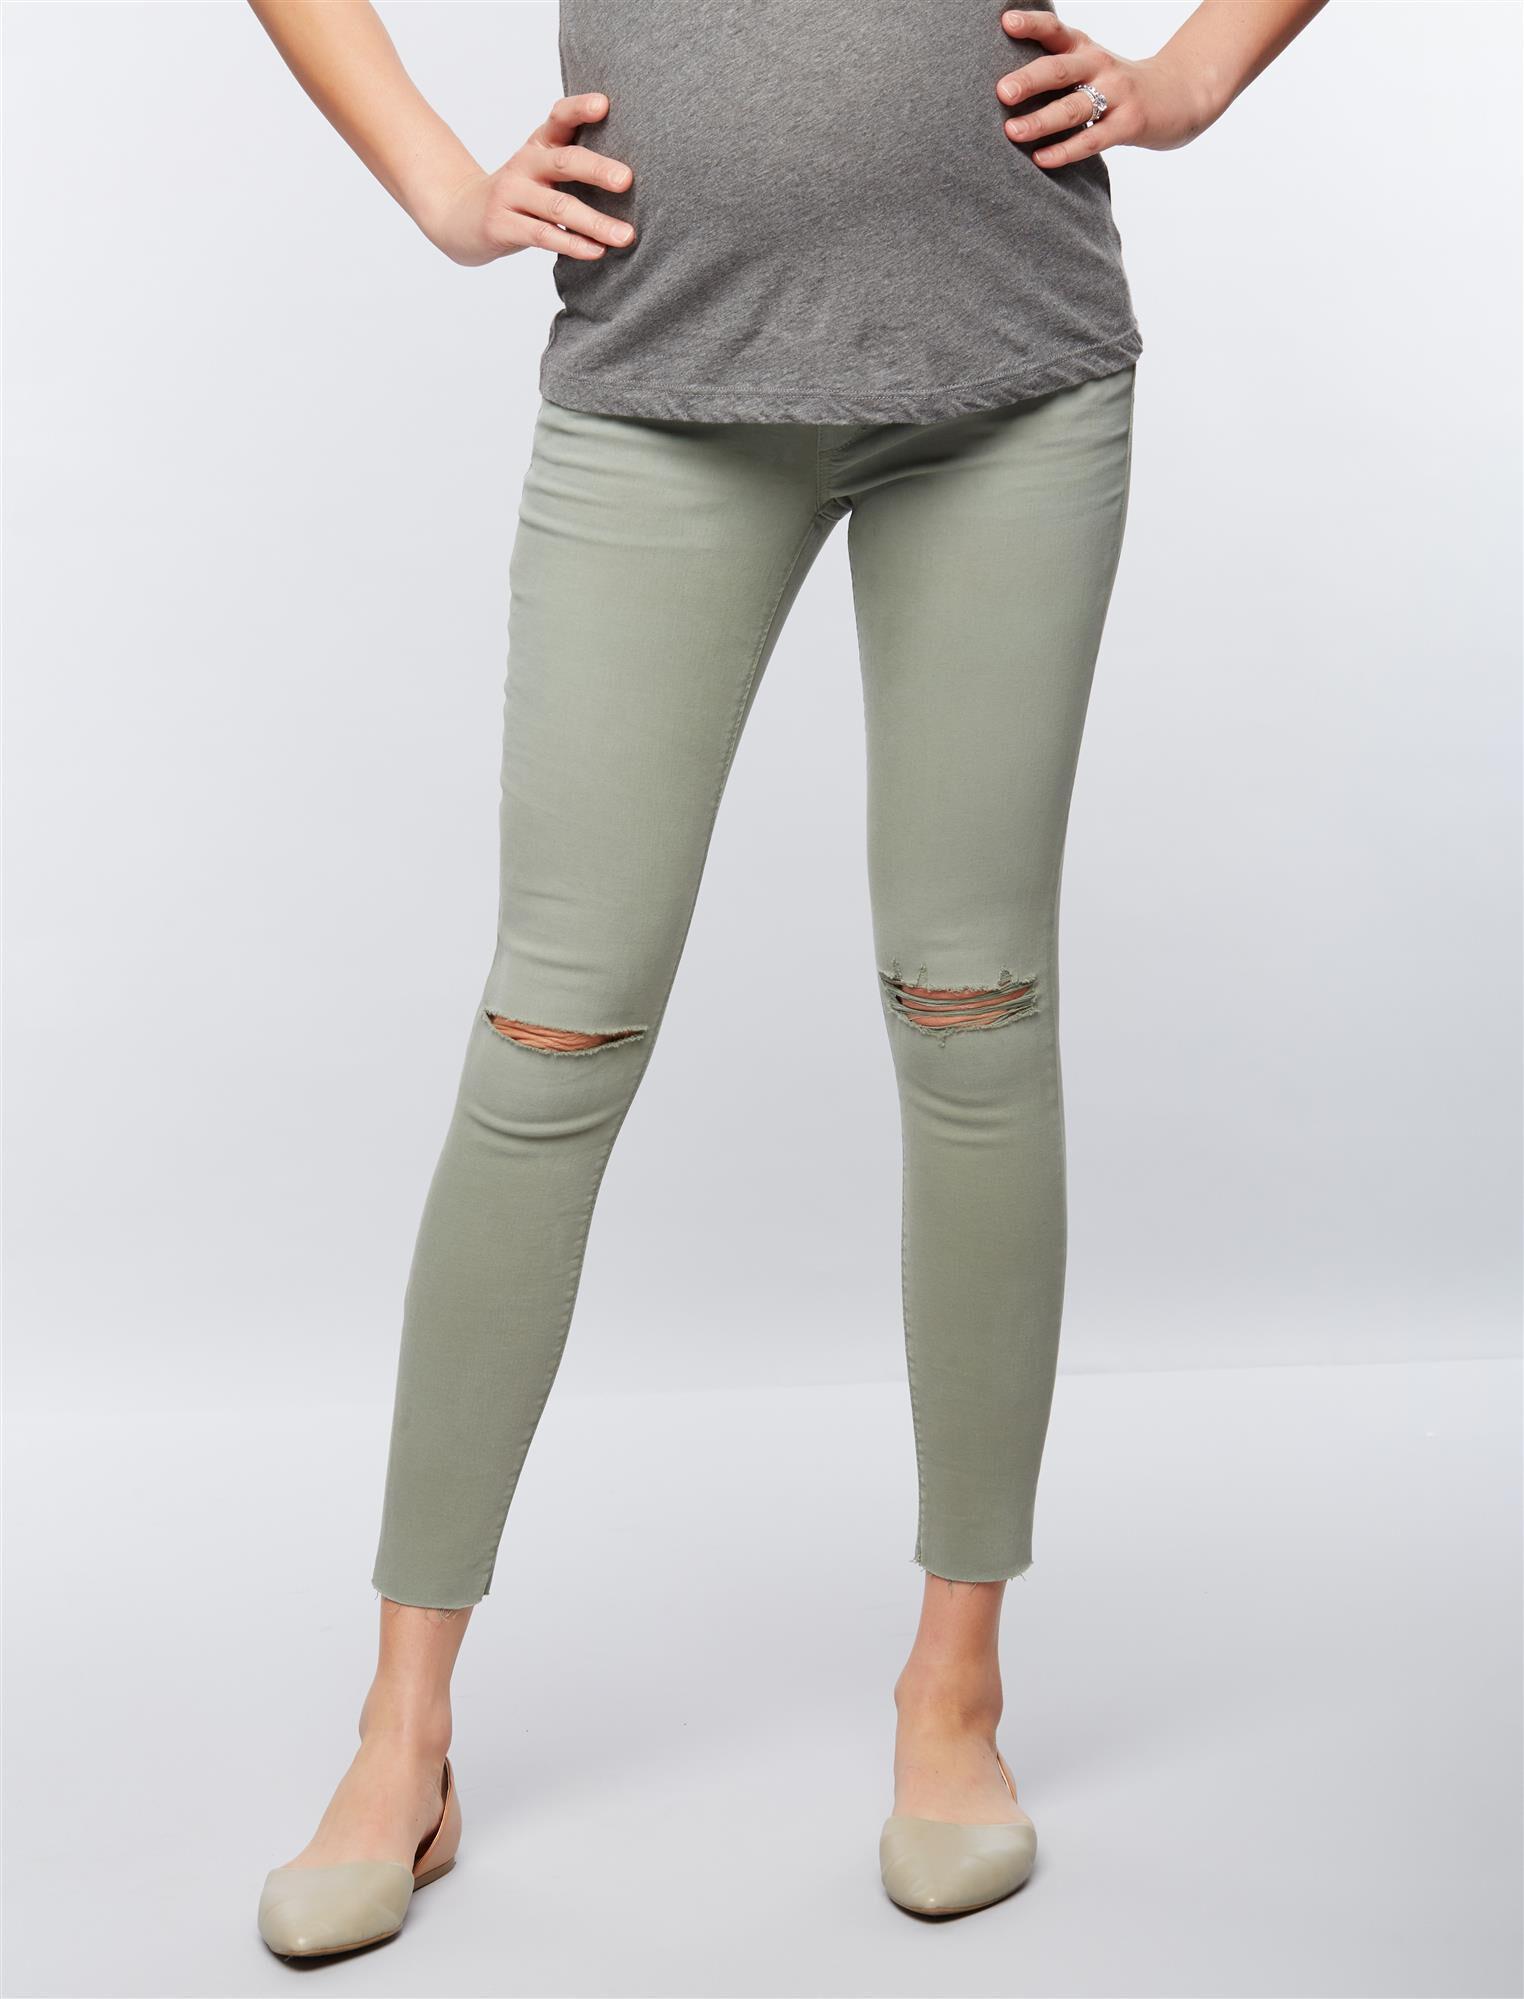 Joe's Jeans Secret Fit Belly Skinny Ankle Maternity Jeans